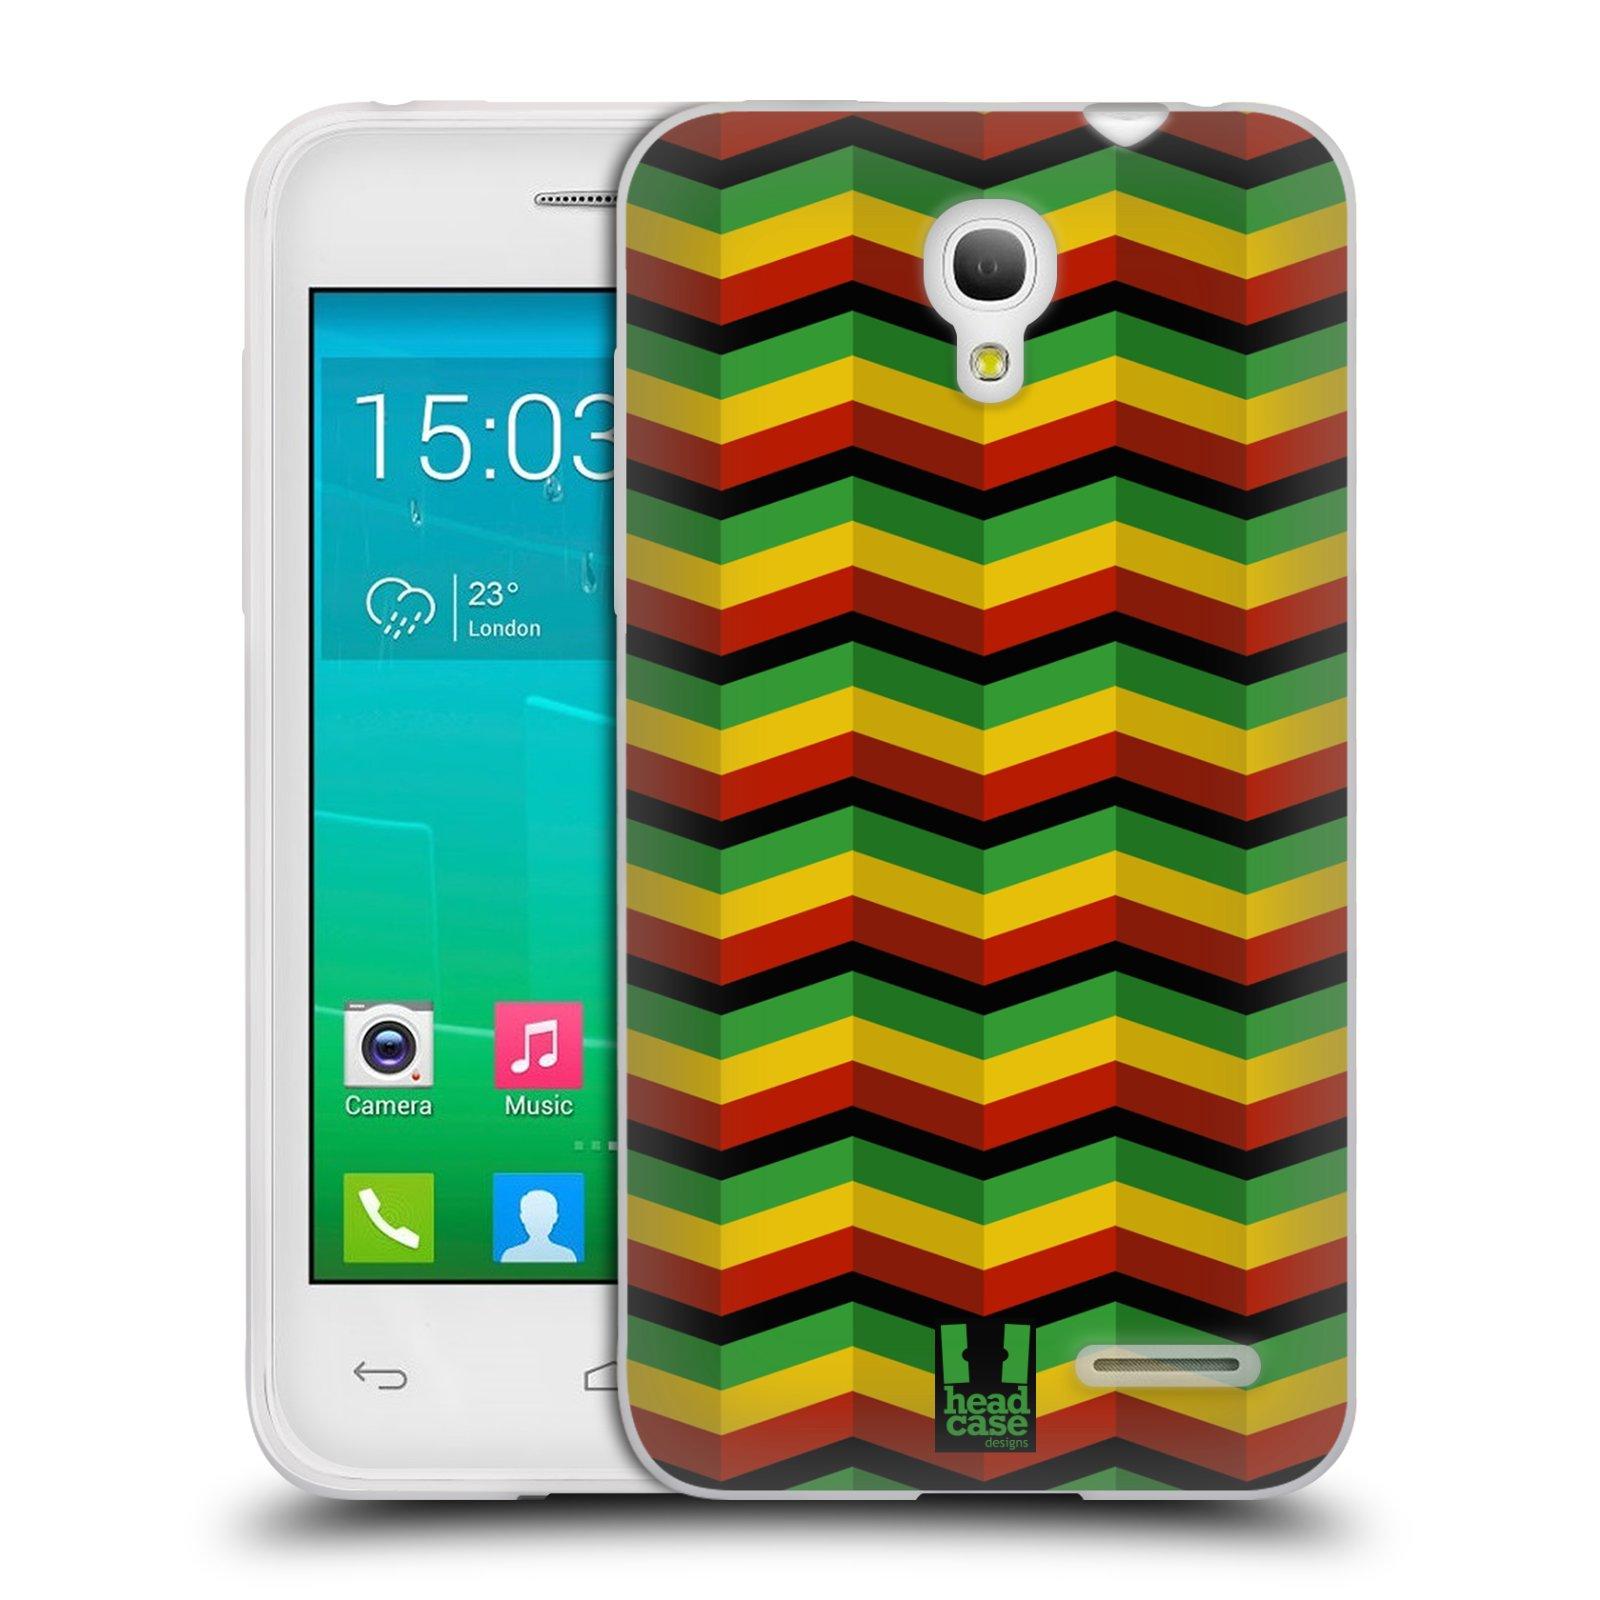 HEAD CASE silikonový obal na mobil Alcatel POP S3 OT-5050Y vzor Rasta barevné vzory CHEVRON